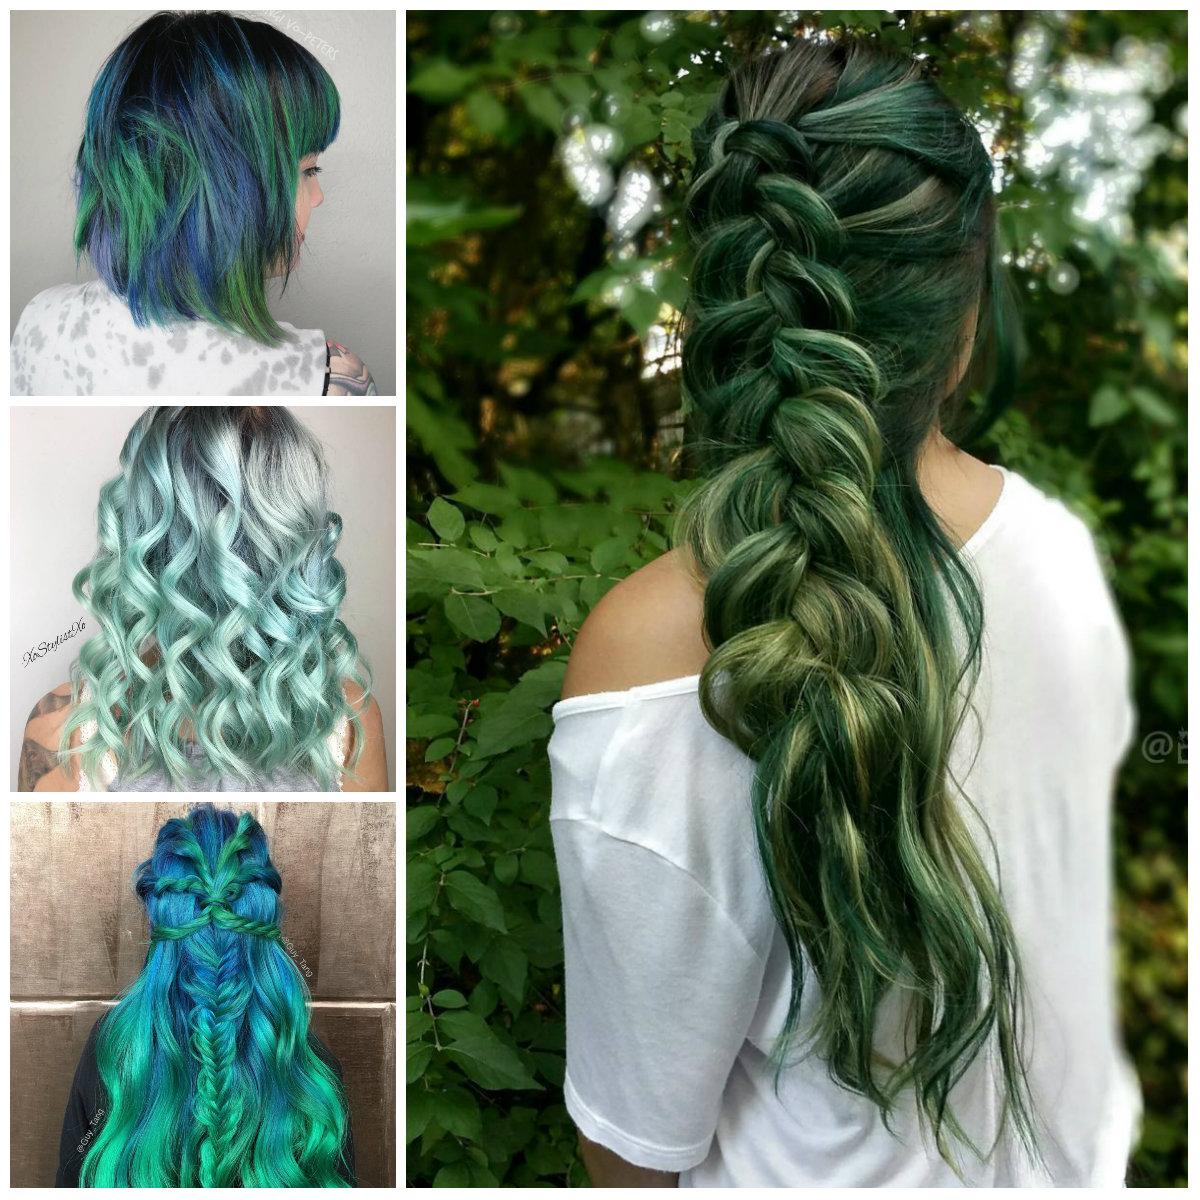 Green Hair Color ideas for 2017